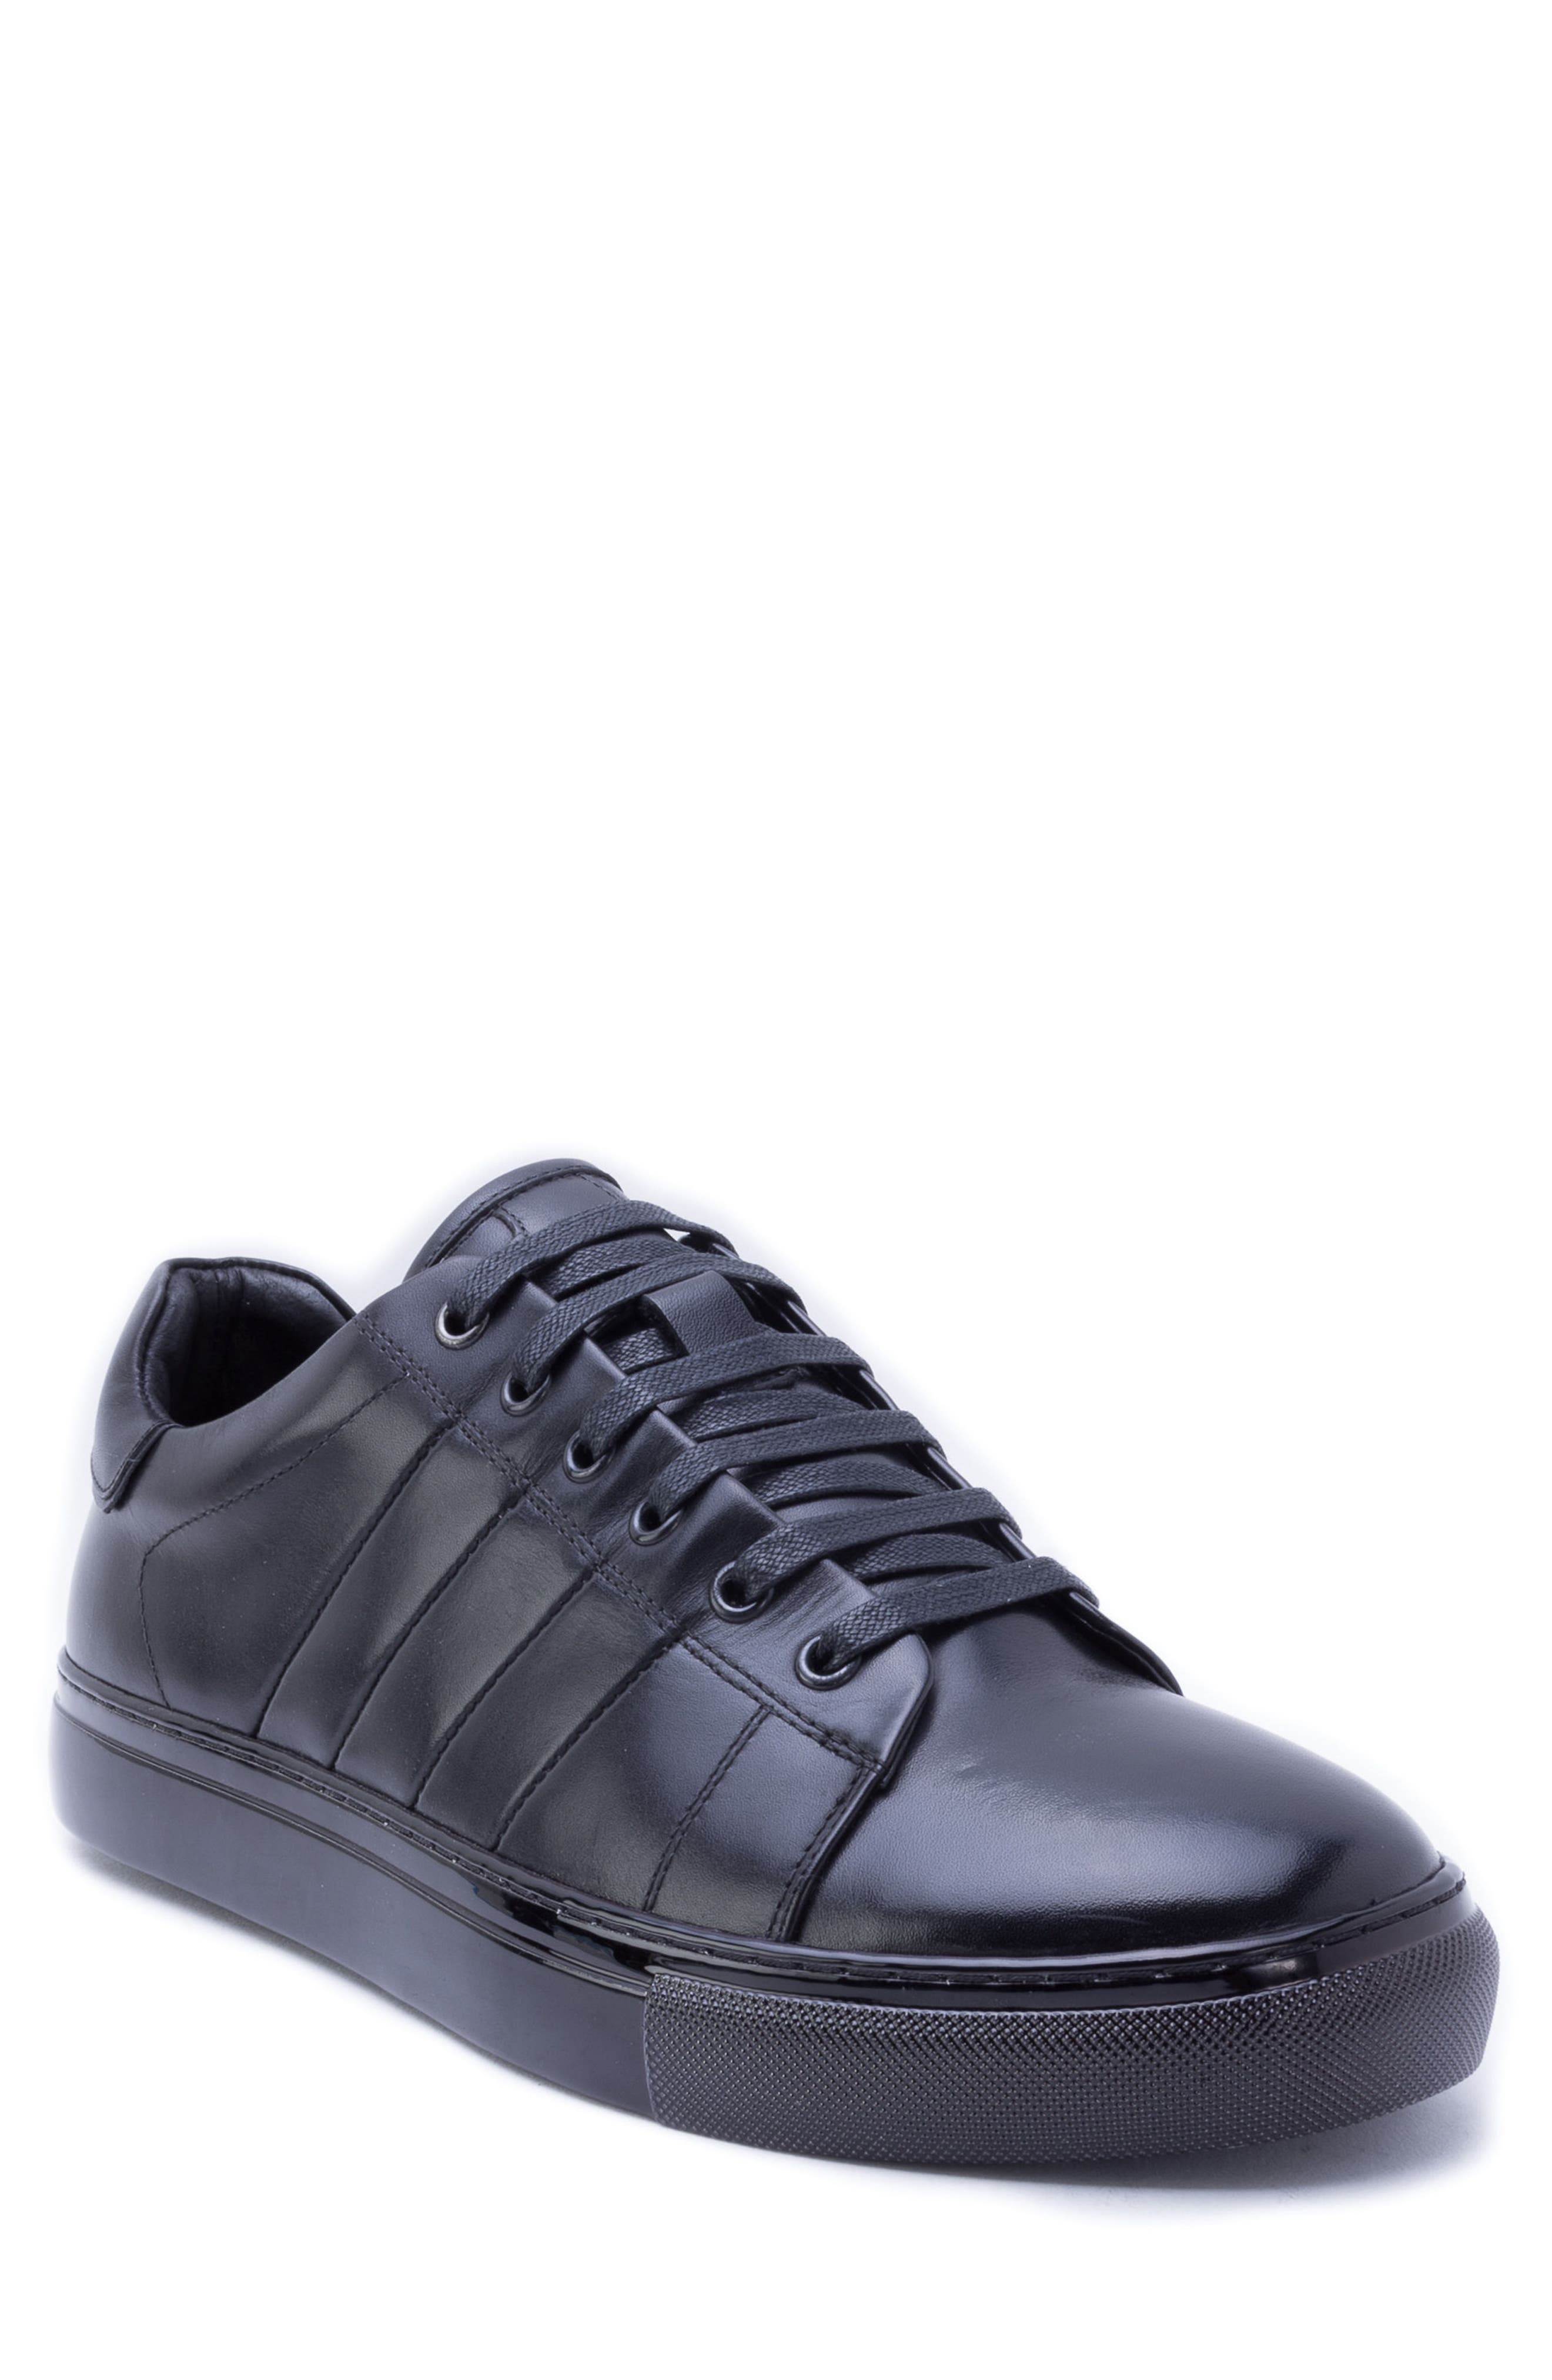 Hackman Sneaker,                             Main thumbnail 1, color,                             BLACK LEATHER